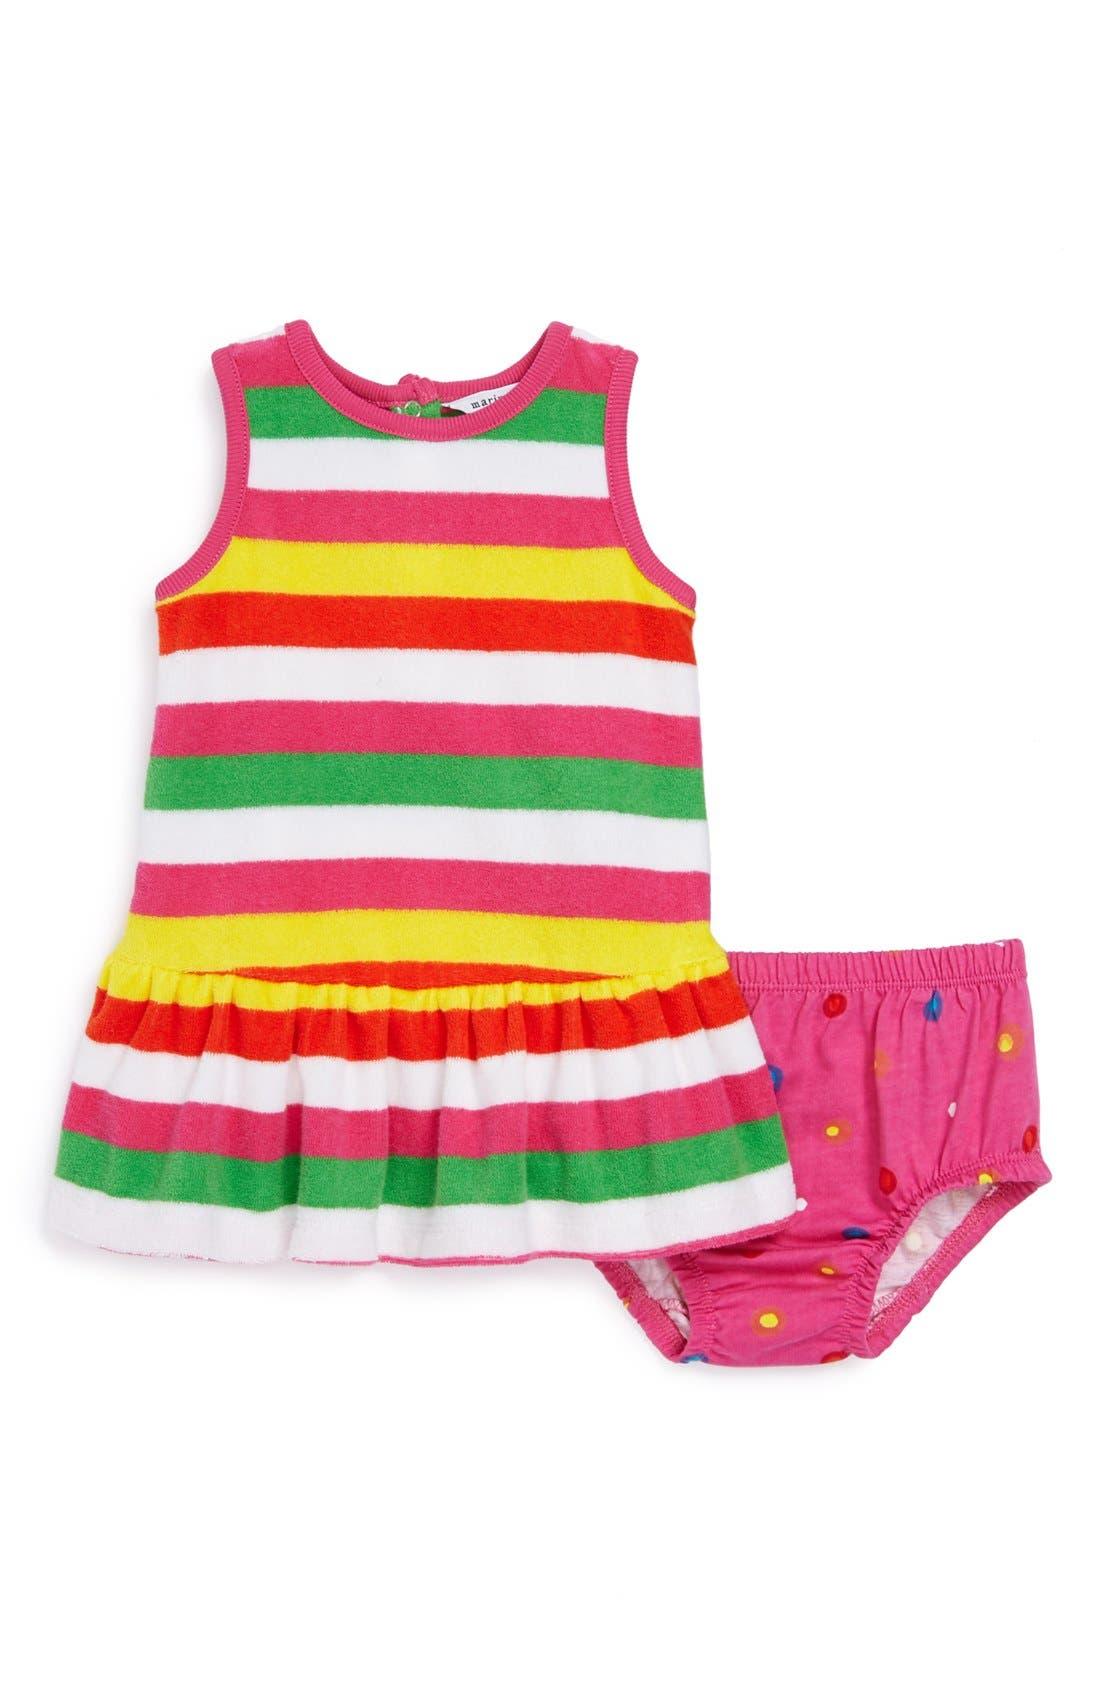 Alternate Image 1 Selected - Marimekko Terry Cloth Dress & Bloomers (Baby Girls)